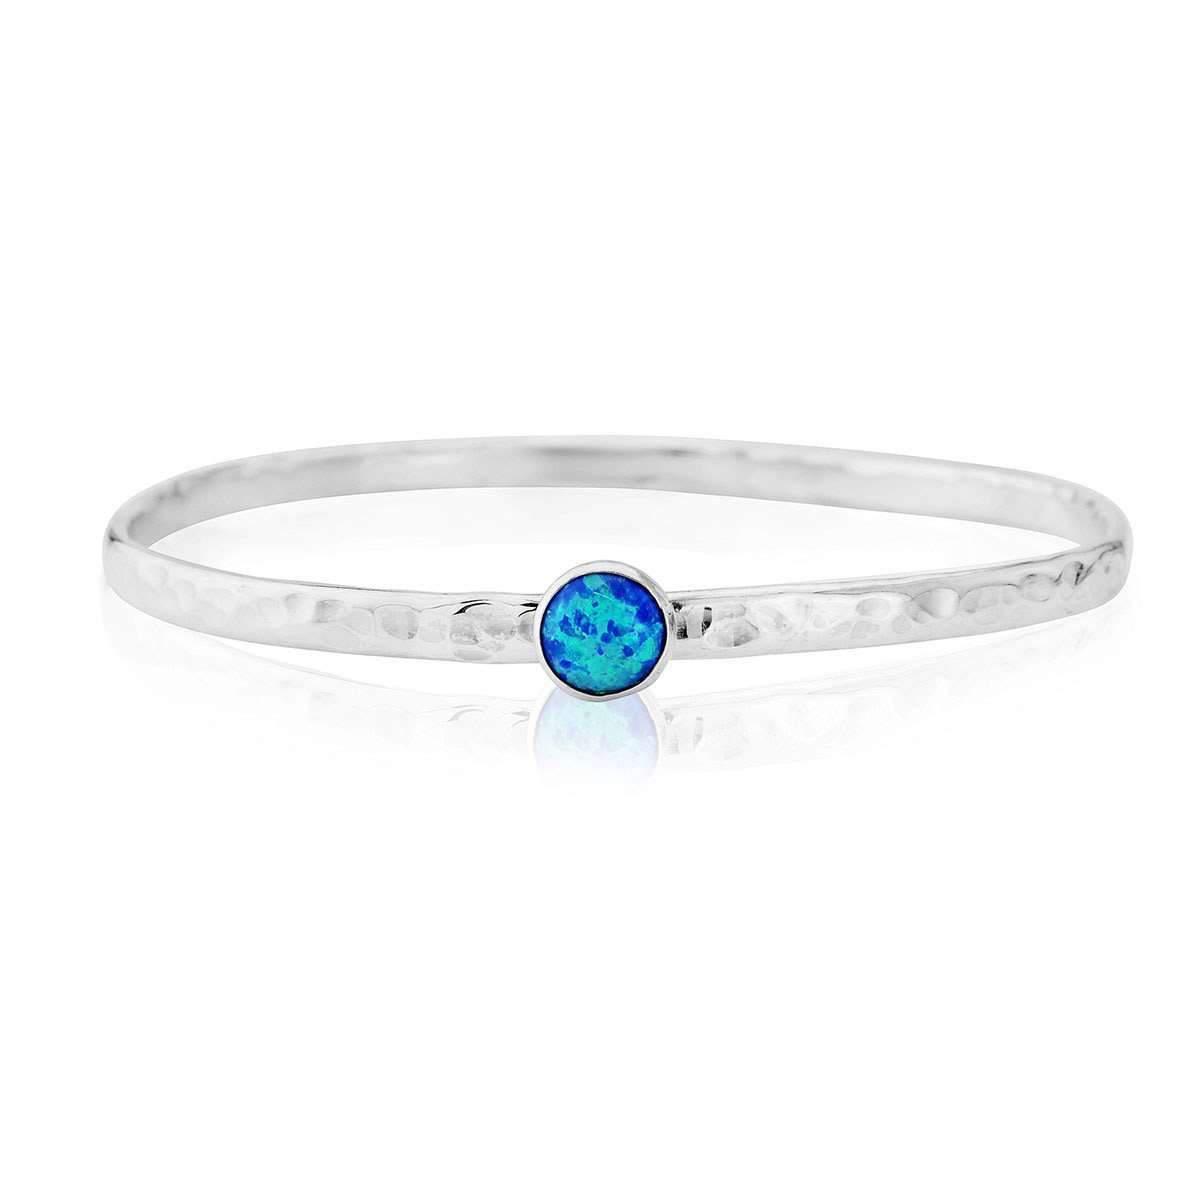 Lavan Sterling Silver & Blue Opal Bangle b3vQQWU3